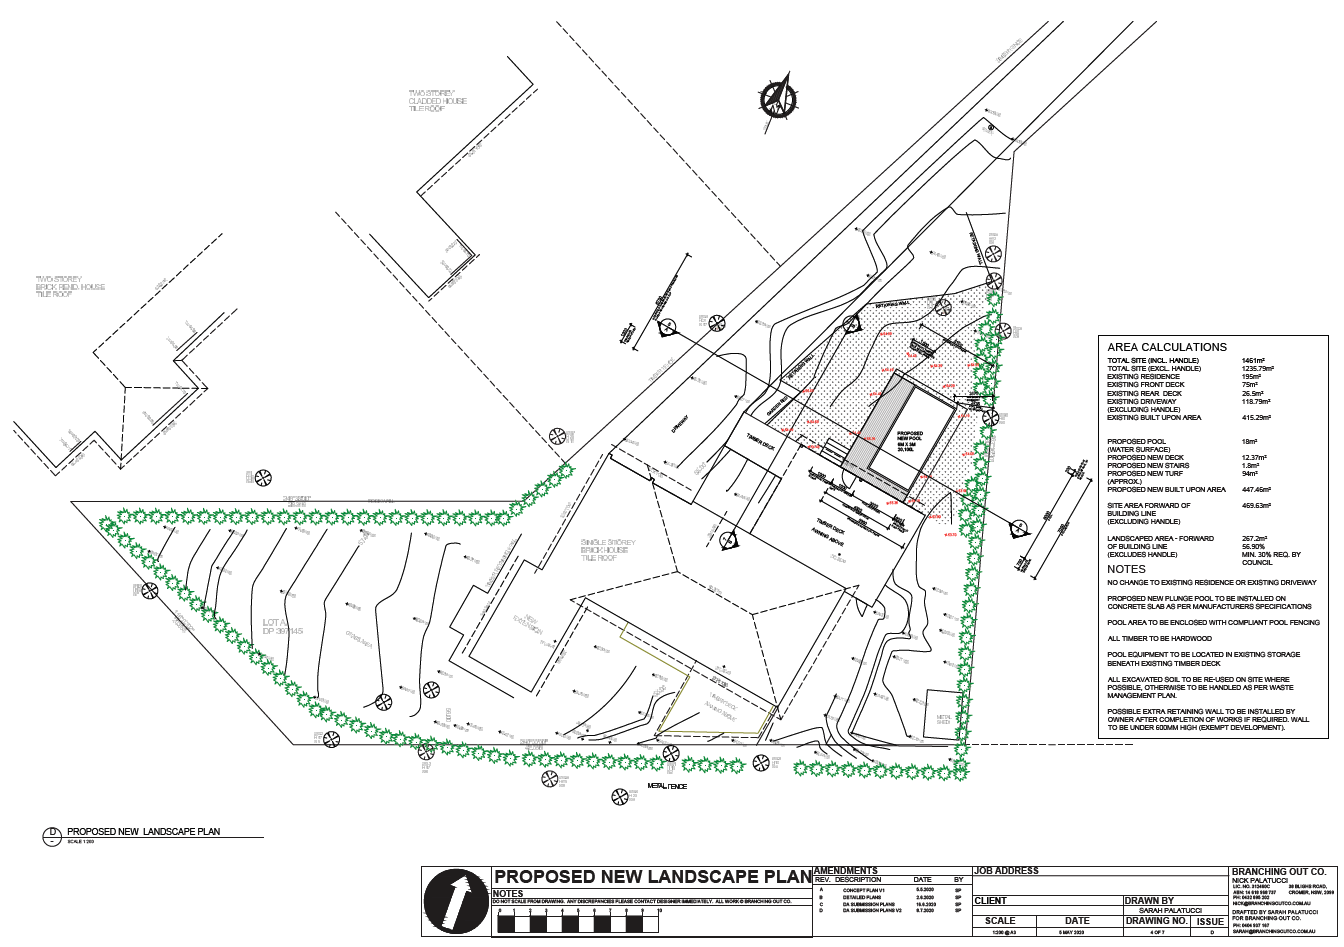 Landscape plan for DA submission